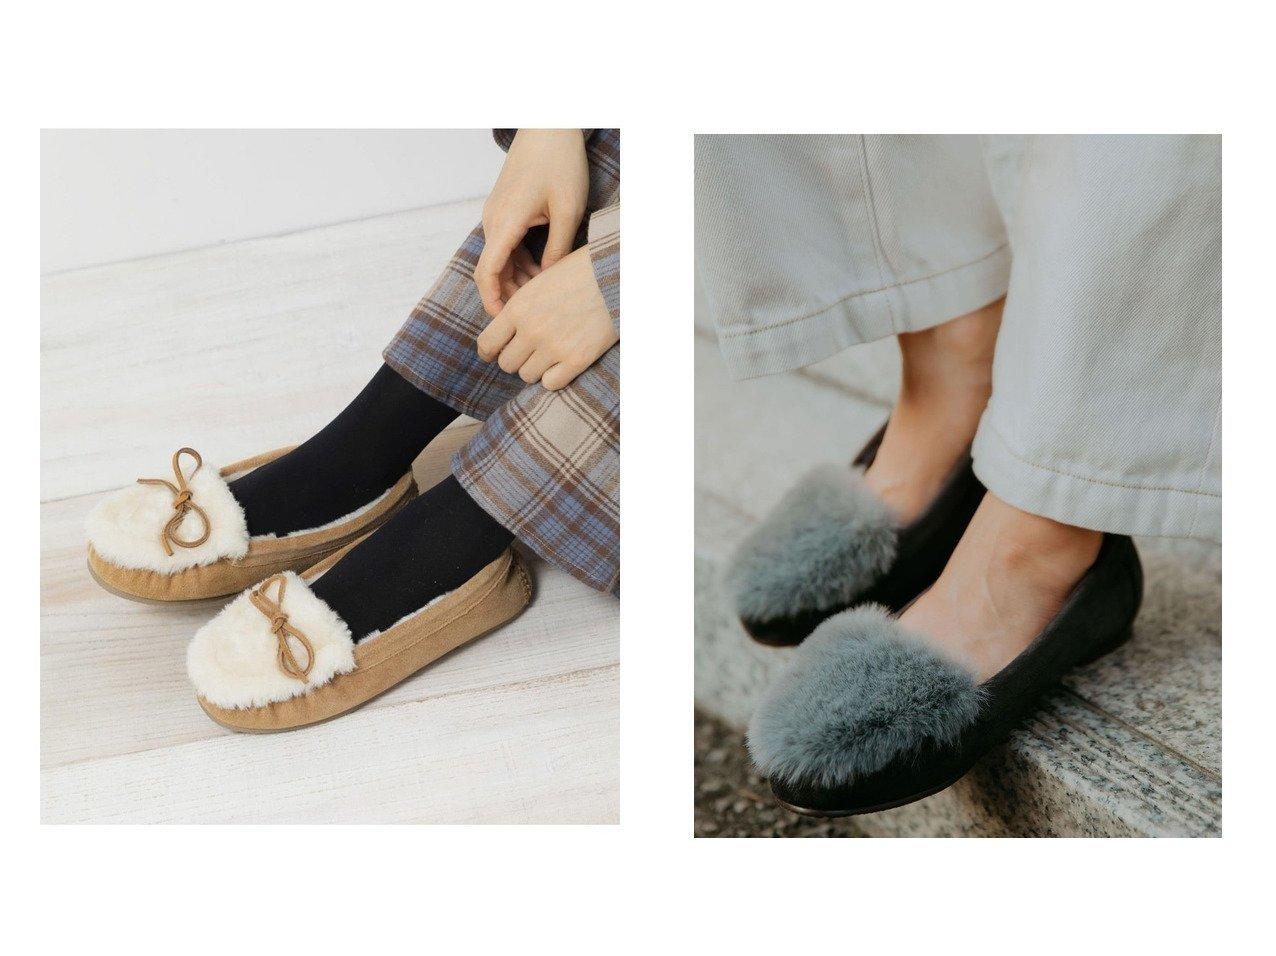 【green label relaxing / UNITED ARROWS/グリーンレーベル リラクシング / ユナイテッドアローズ】の22.0cm~25.0cm CFC フェイクファー ウォーム フラットシューズ (1cmヒール)&【Sonny Label / URBAN RESEARCH/サニーレーベル】のMINNETONKA KYLAH SLIPPER シューズ・靴のおすすめ!人気、トレンド・レディースファッションの通販  おすすめで人気の流行・トレンド、ファッションの通販商品 メンズファッション・キッズファッション・インテリア・家具・レディースファッション・服の通販 founy(ファニー) https://founy.com/ ファッション Fashion レディースファッション WOMEN シューズ スエード スニーカー スリッポン フェイクファー ベーシック ウォーム サテン デニム フラット ロング 今季 冬 Winter 防寒 |ID:crp329100000010827